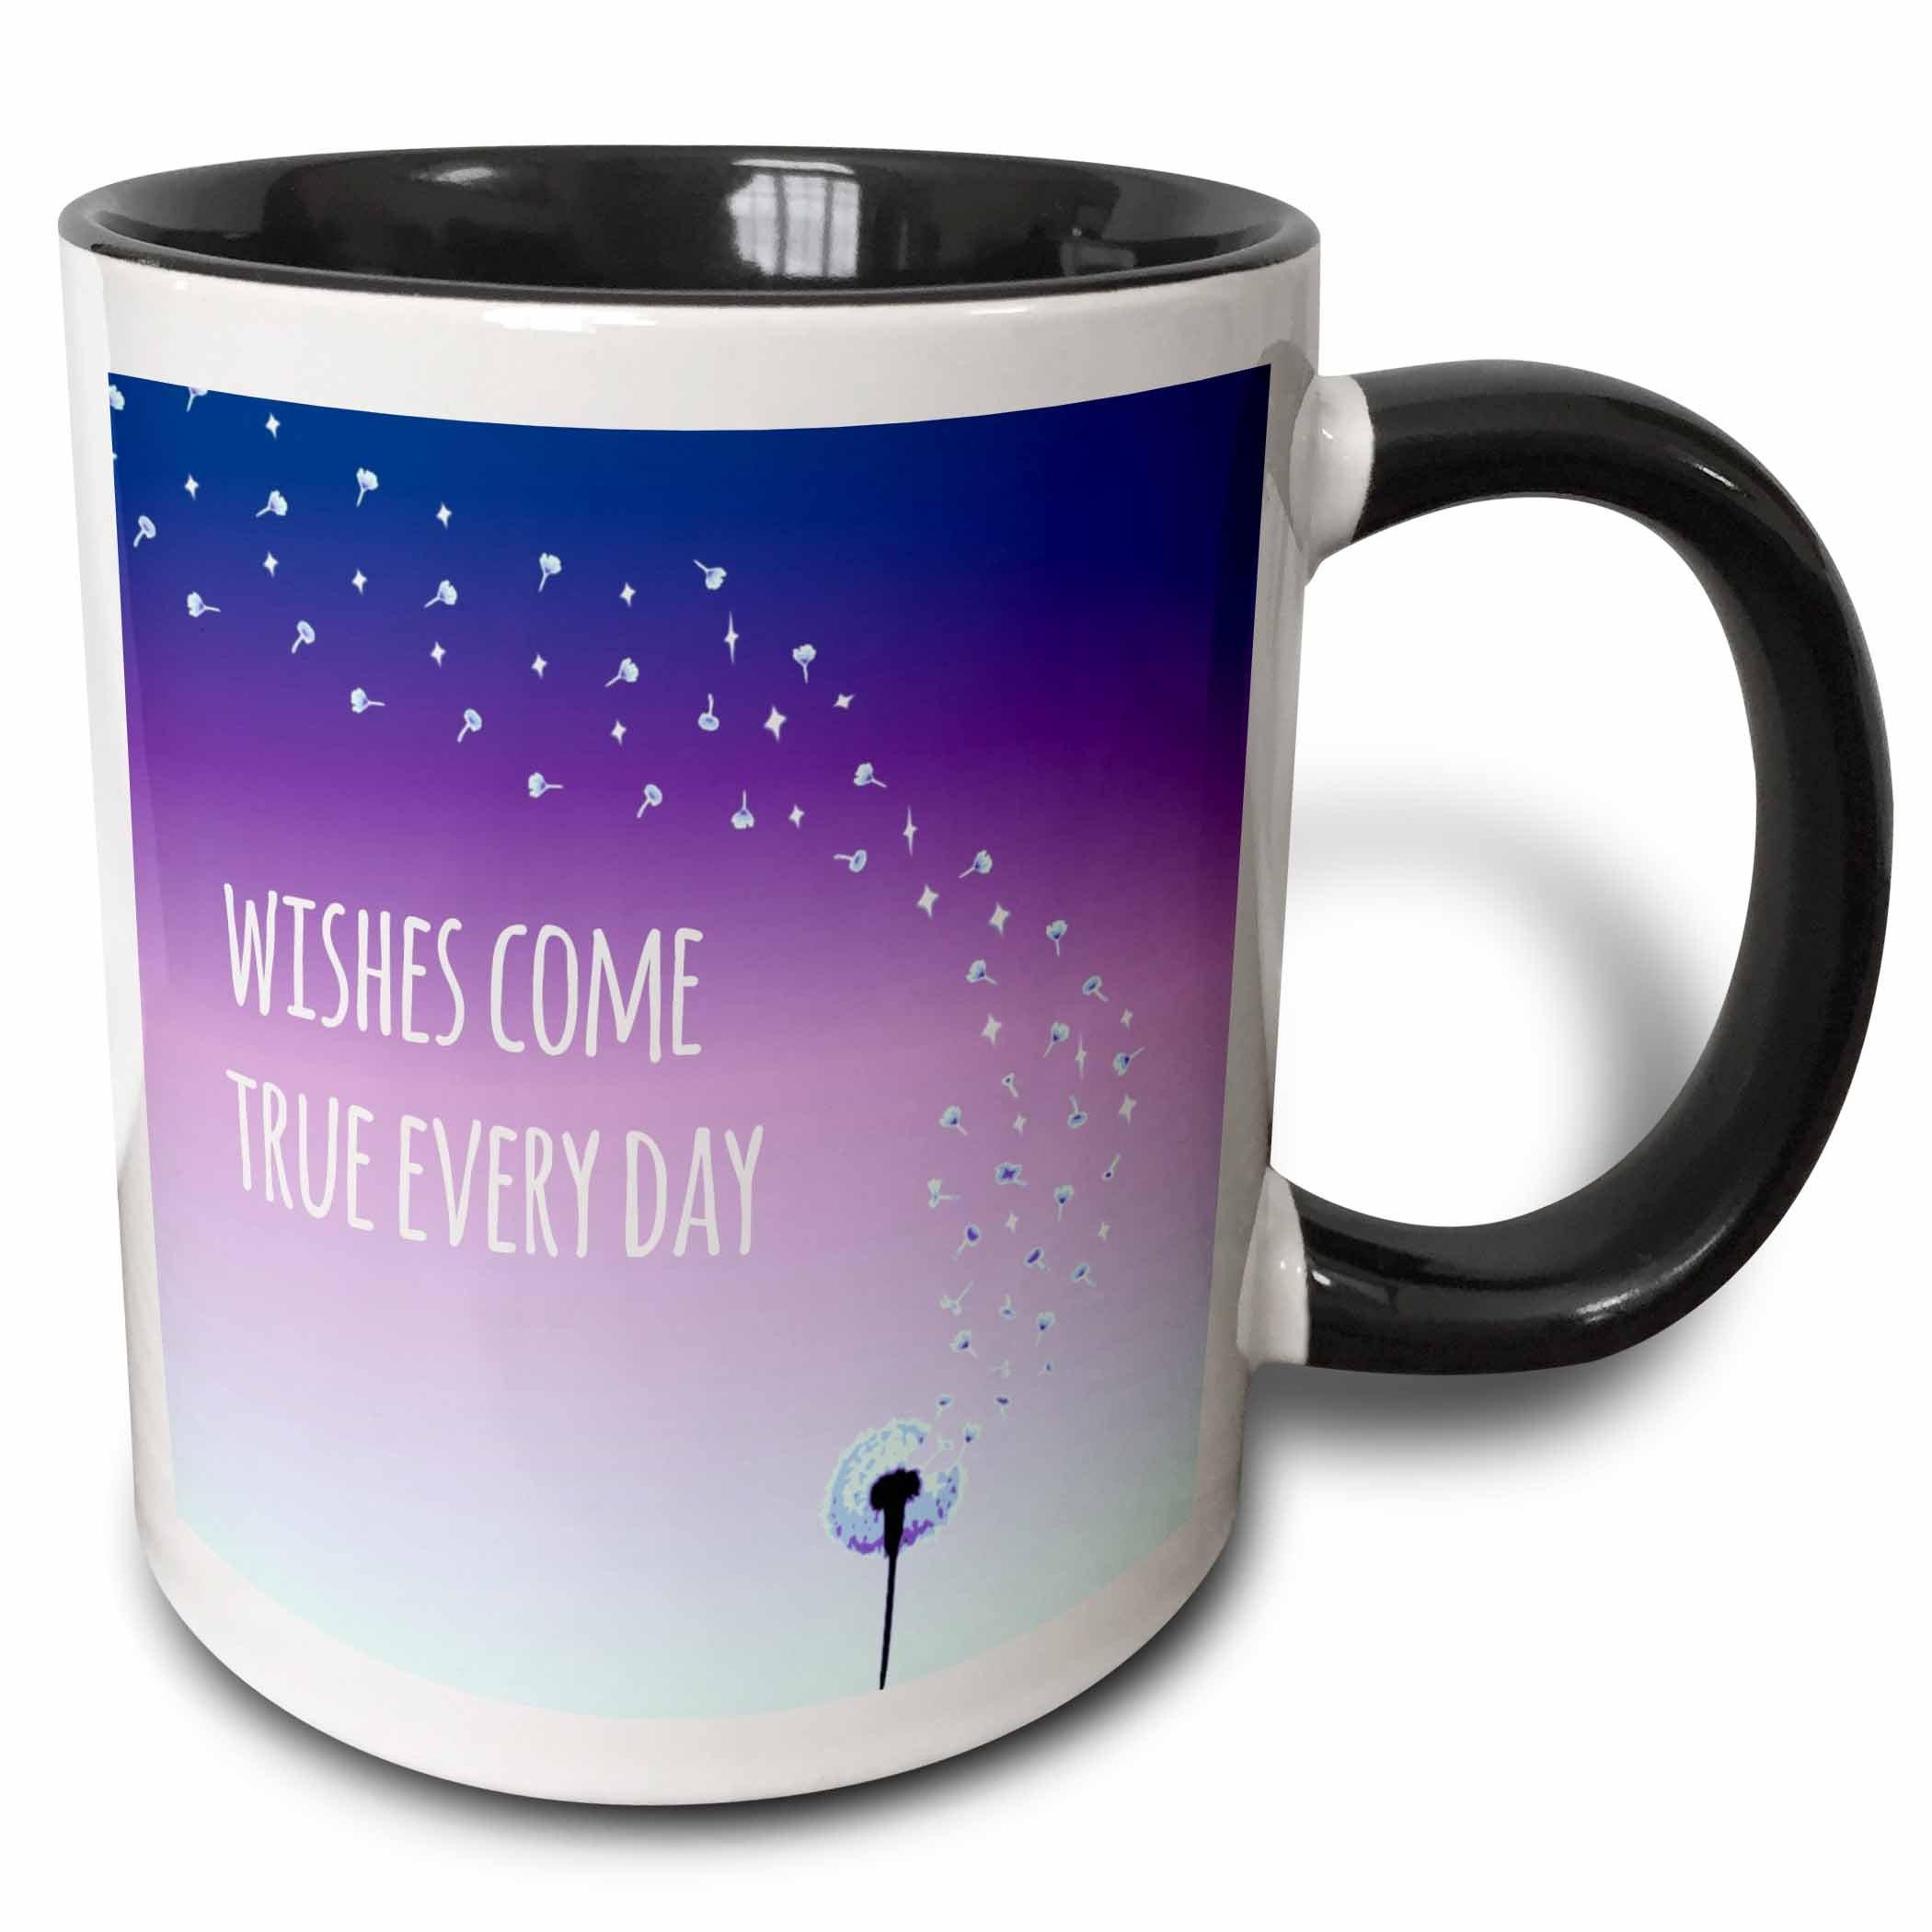 3dRose (mug_151375_4) Wishes come true every day - inspirational motivational sayings - motivation - purple dandelion wish - Two Tone Black Mug, 11oz